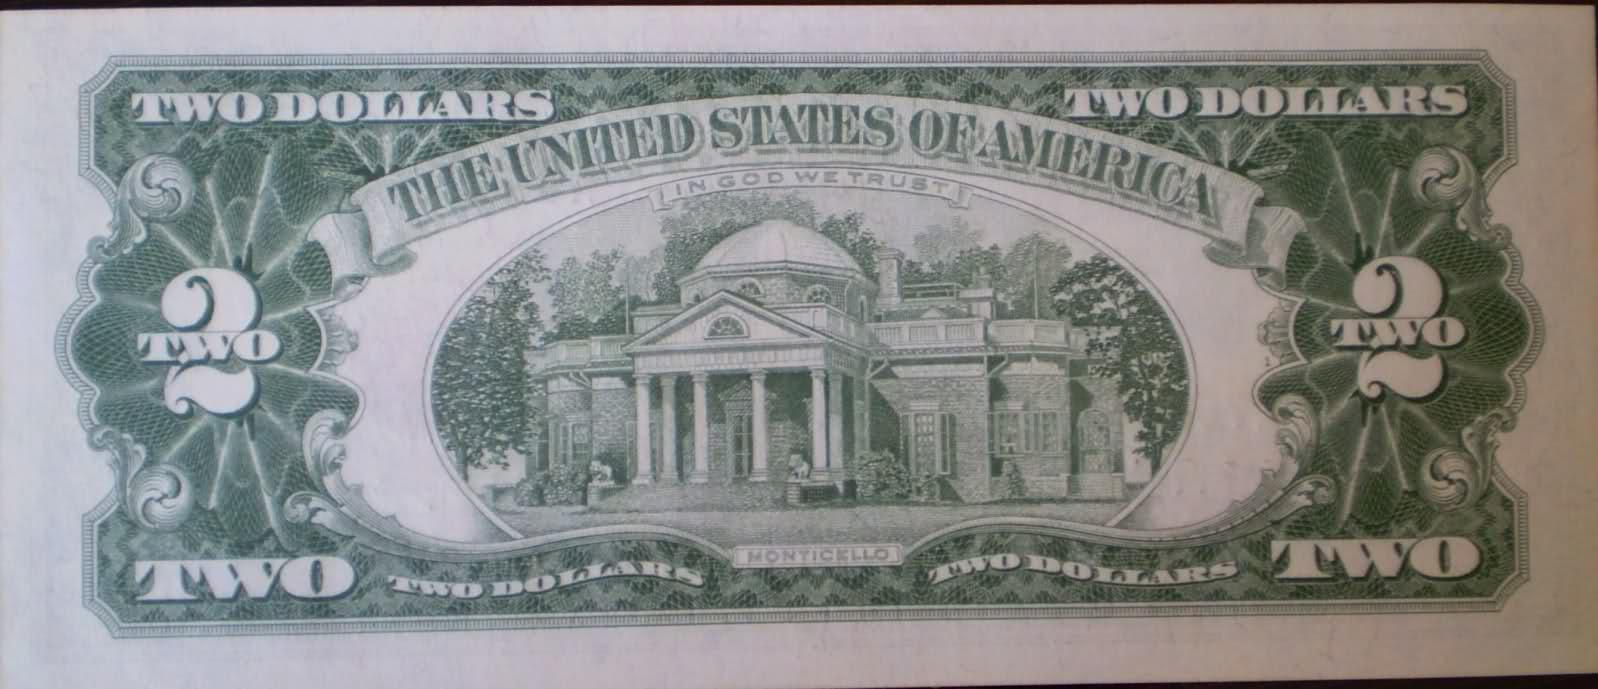 2 Dolares de Estados Unidos Emision 1963 34of0ag